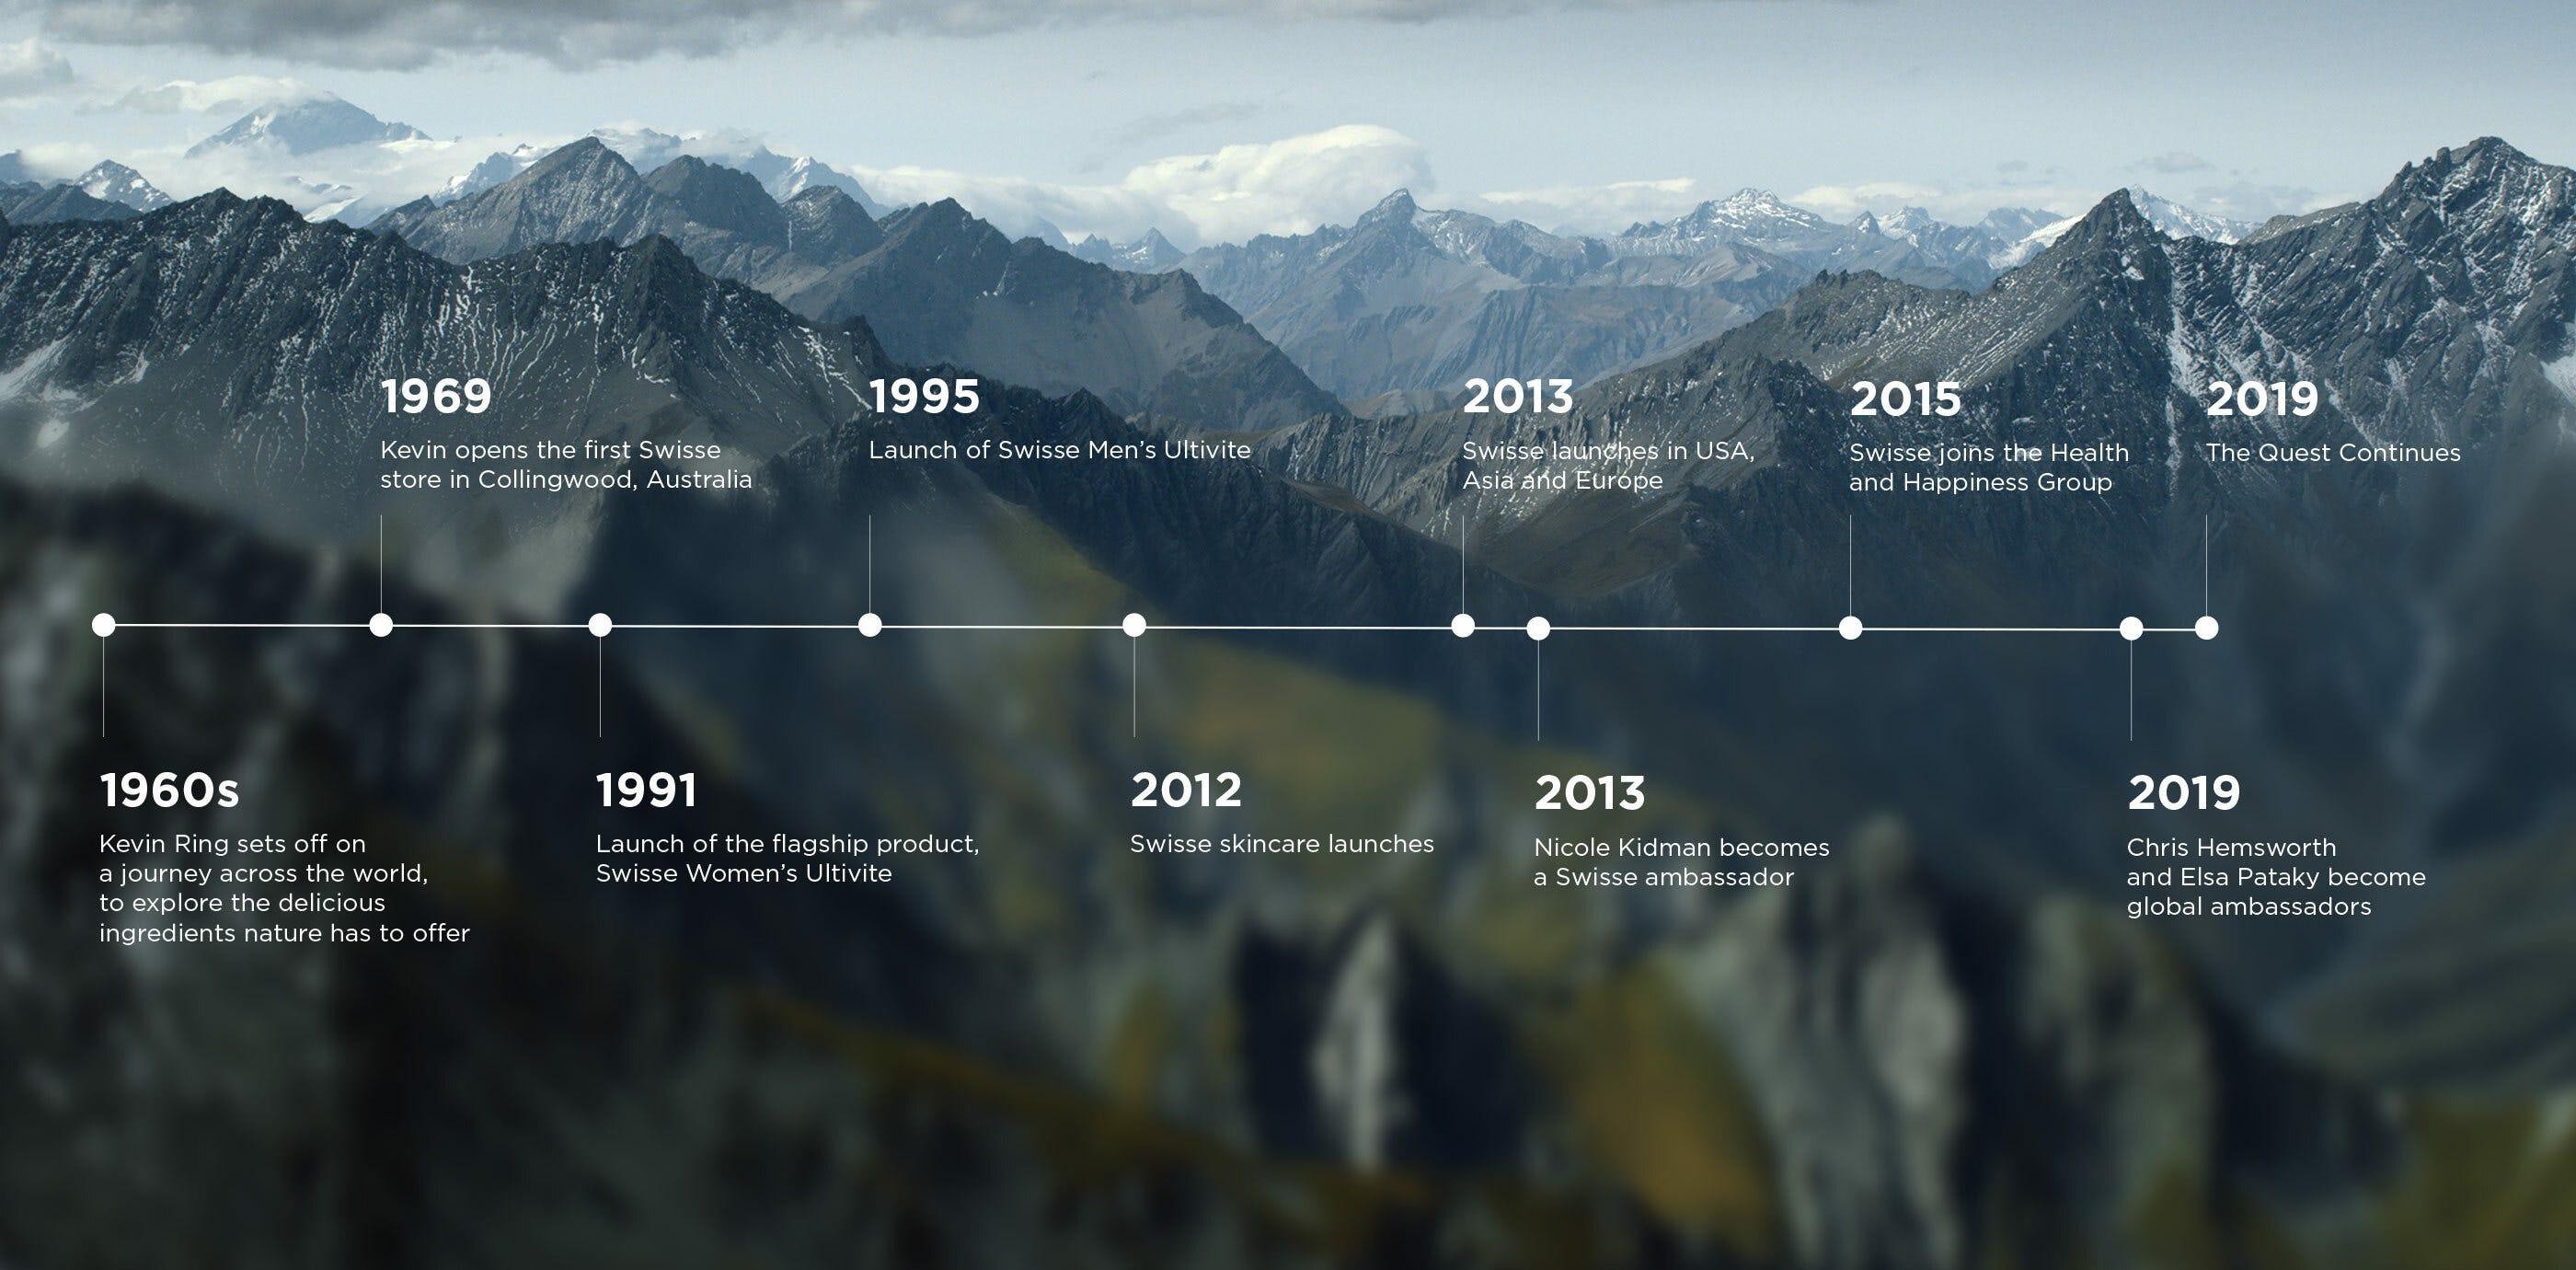 Swisse Timeline